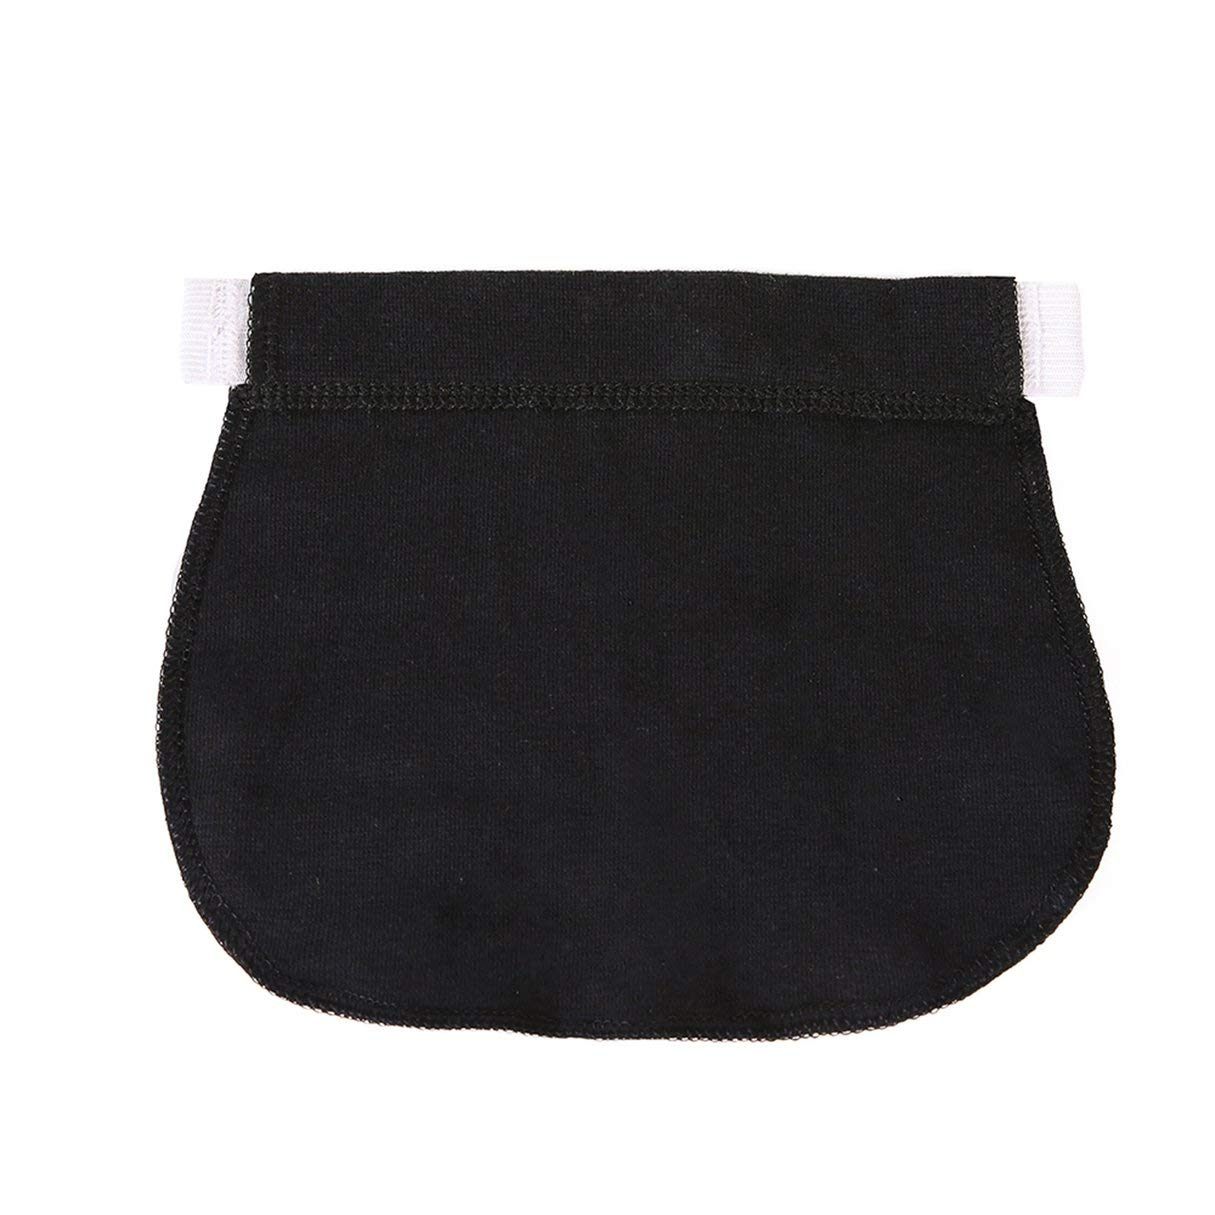 Maternity Pregnancy Waistband Belt Adjustable Elastic Waist Extender Clothing Pants for Pregnant